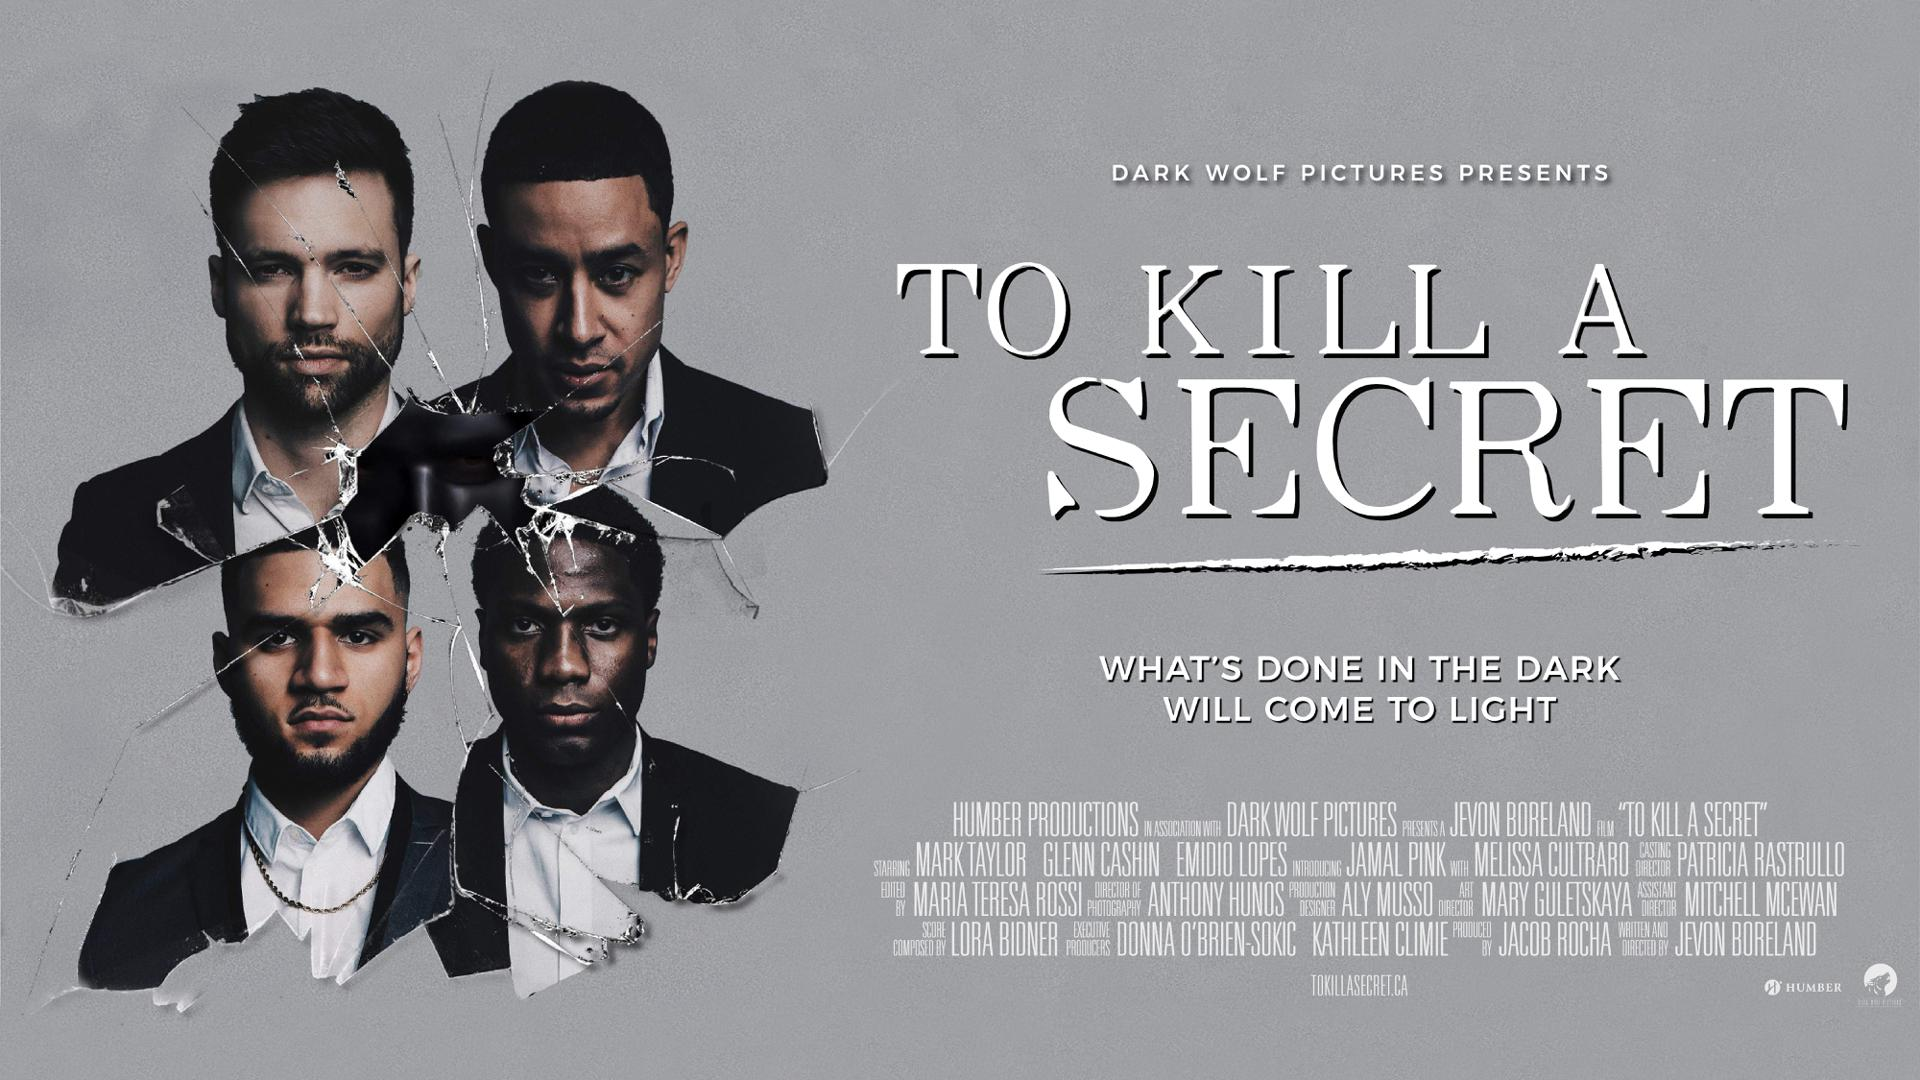 To Kill A Secret